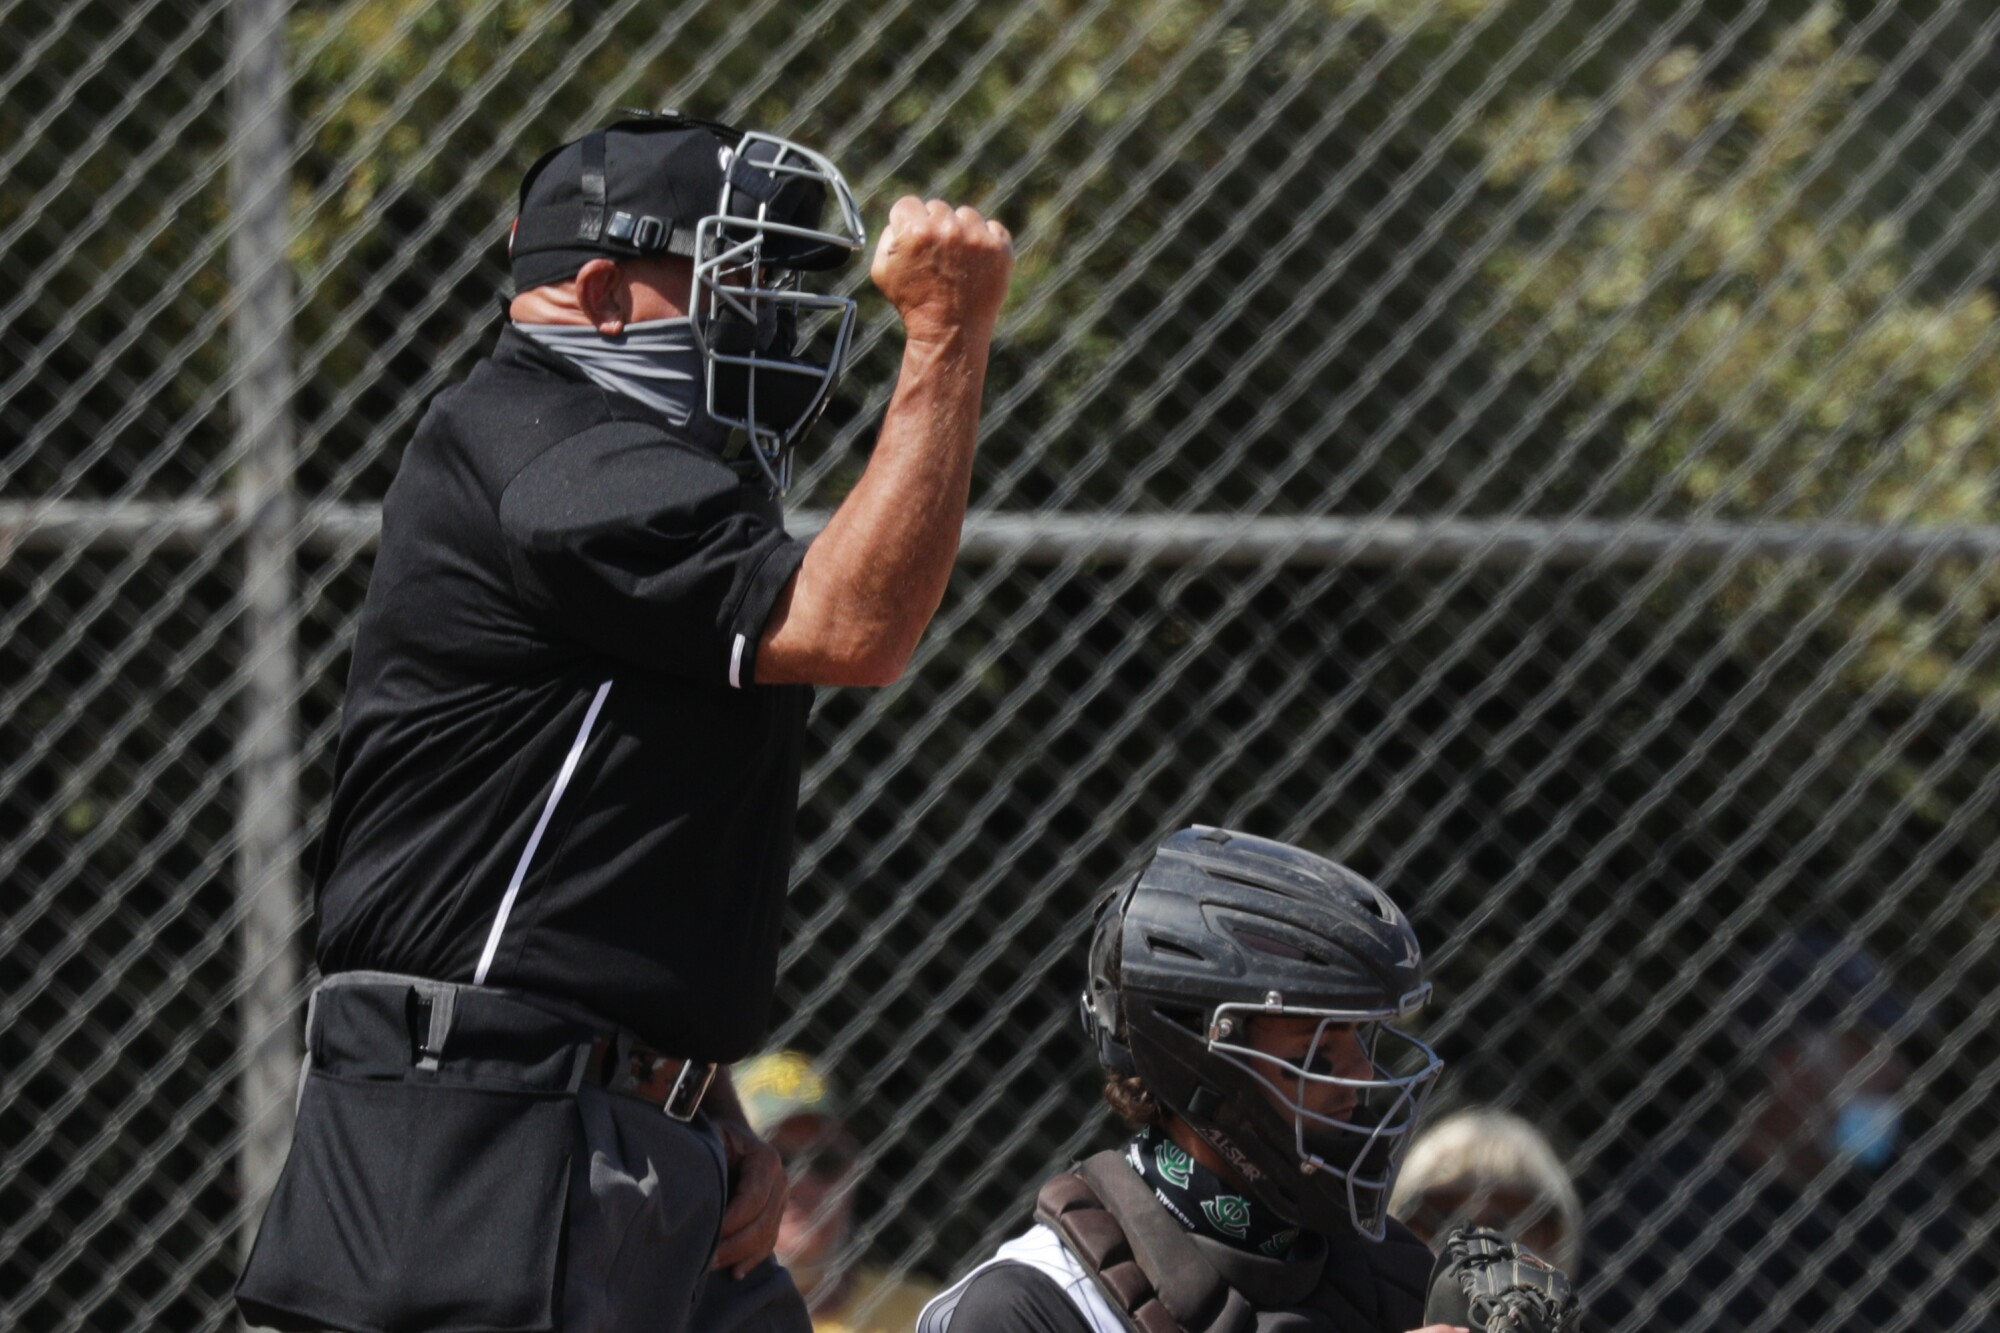 An umpire makes a call during a baseball game